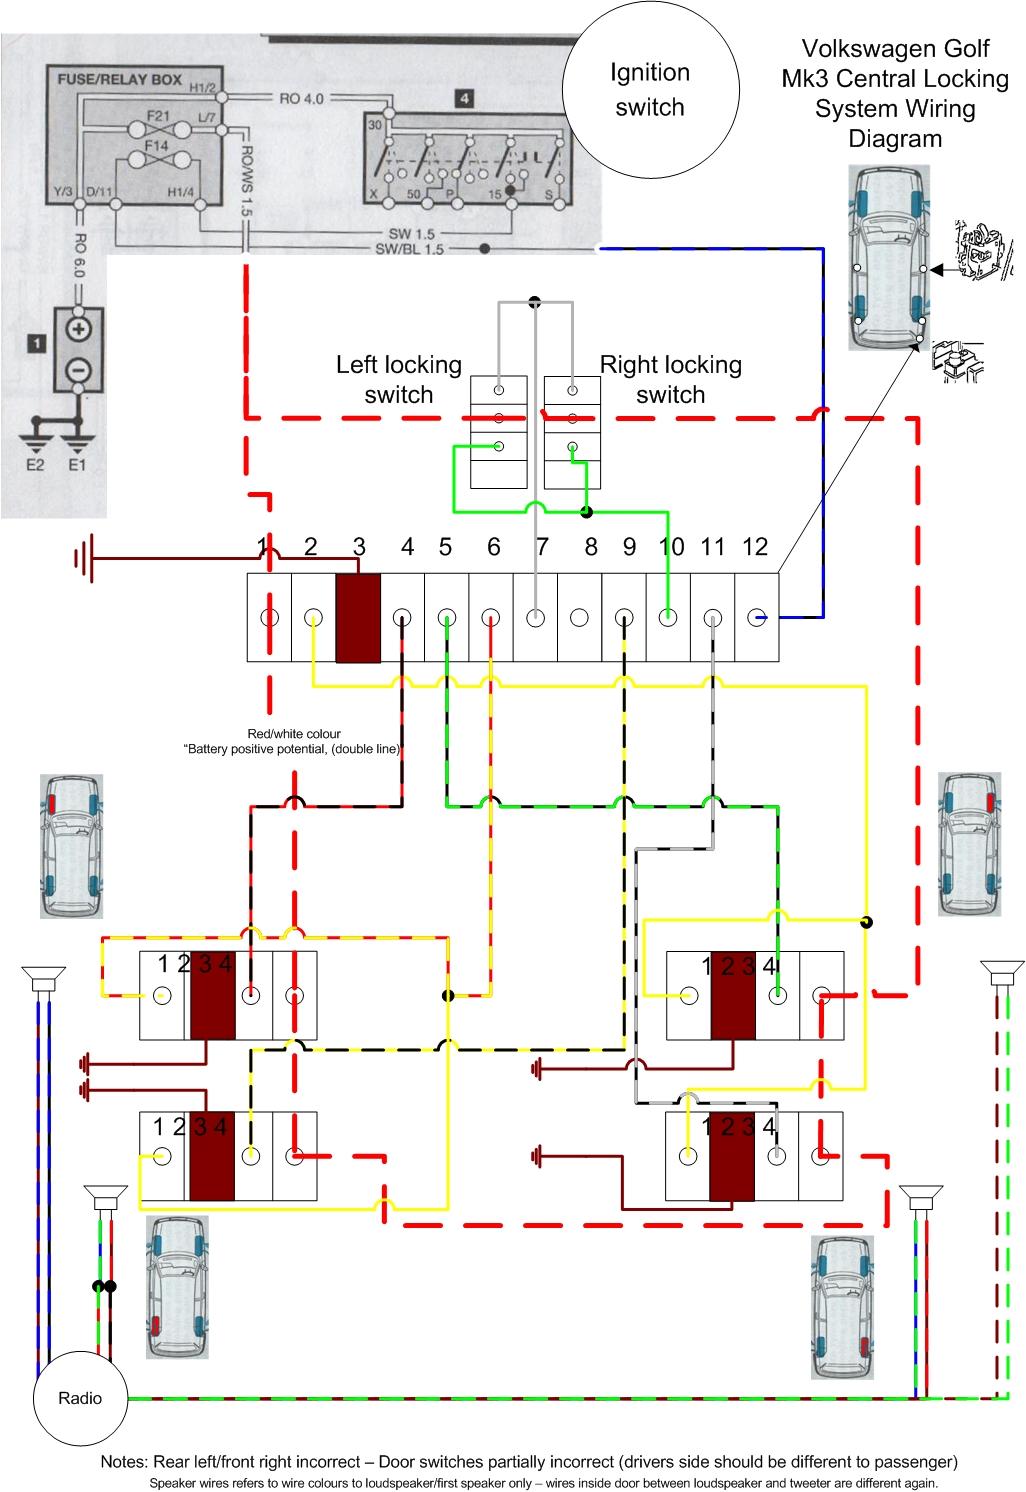 fast lock central locking wiring diagram